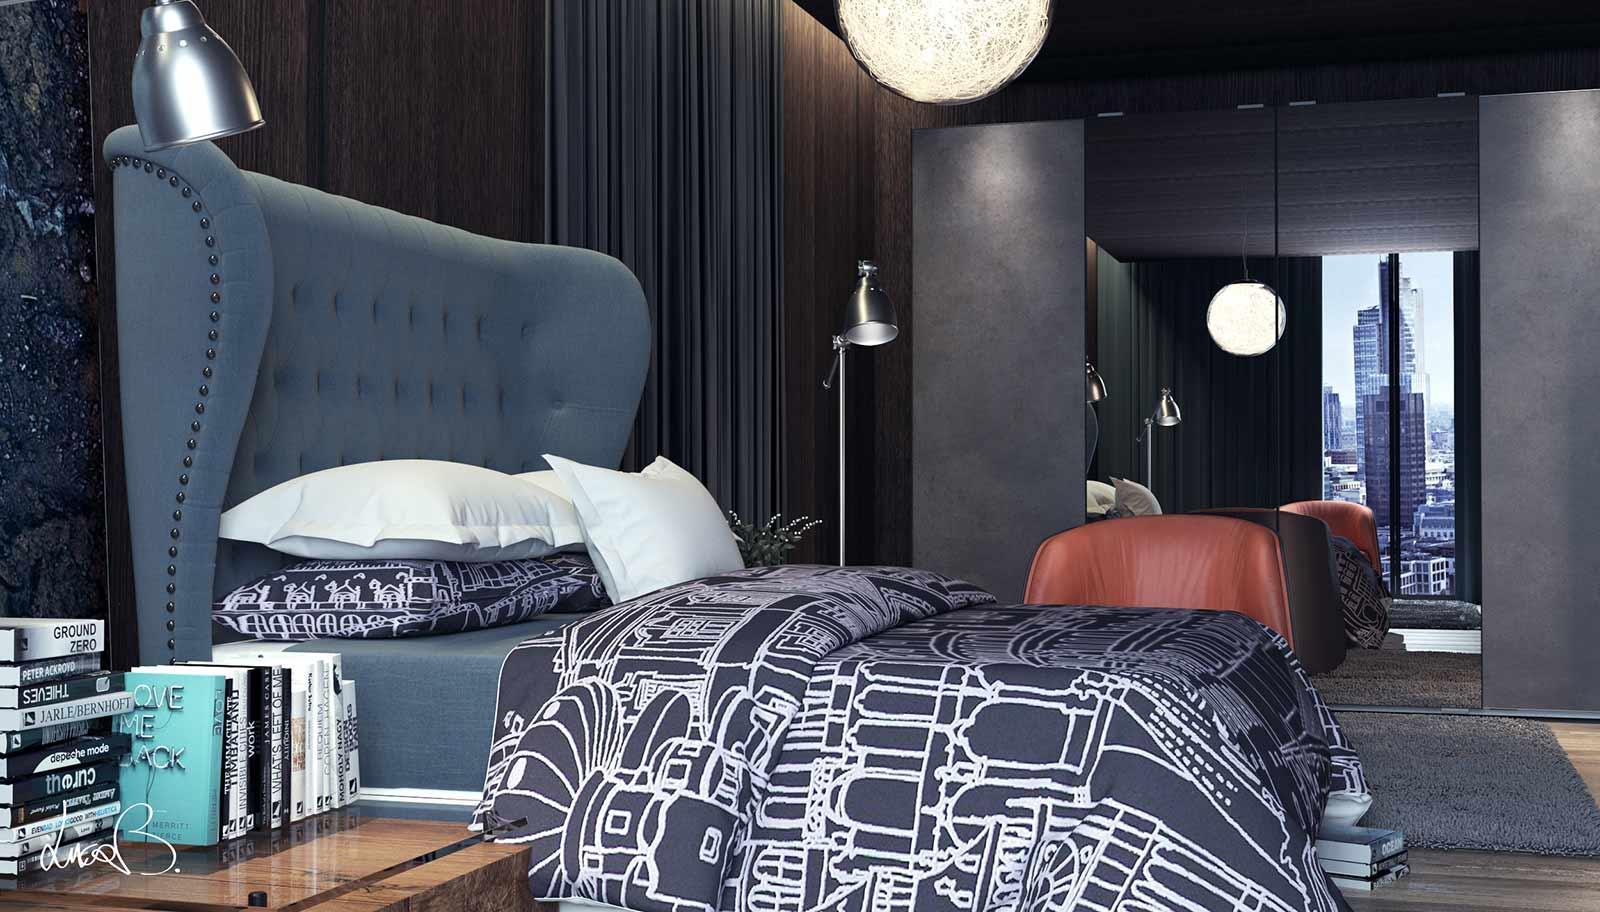 bed40002f.jpg